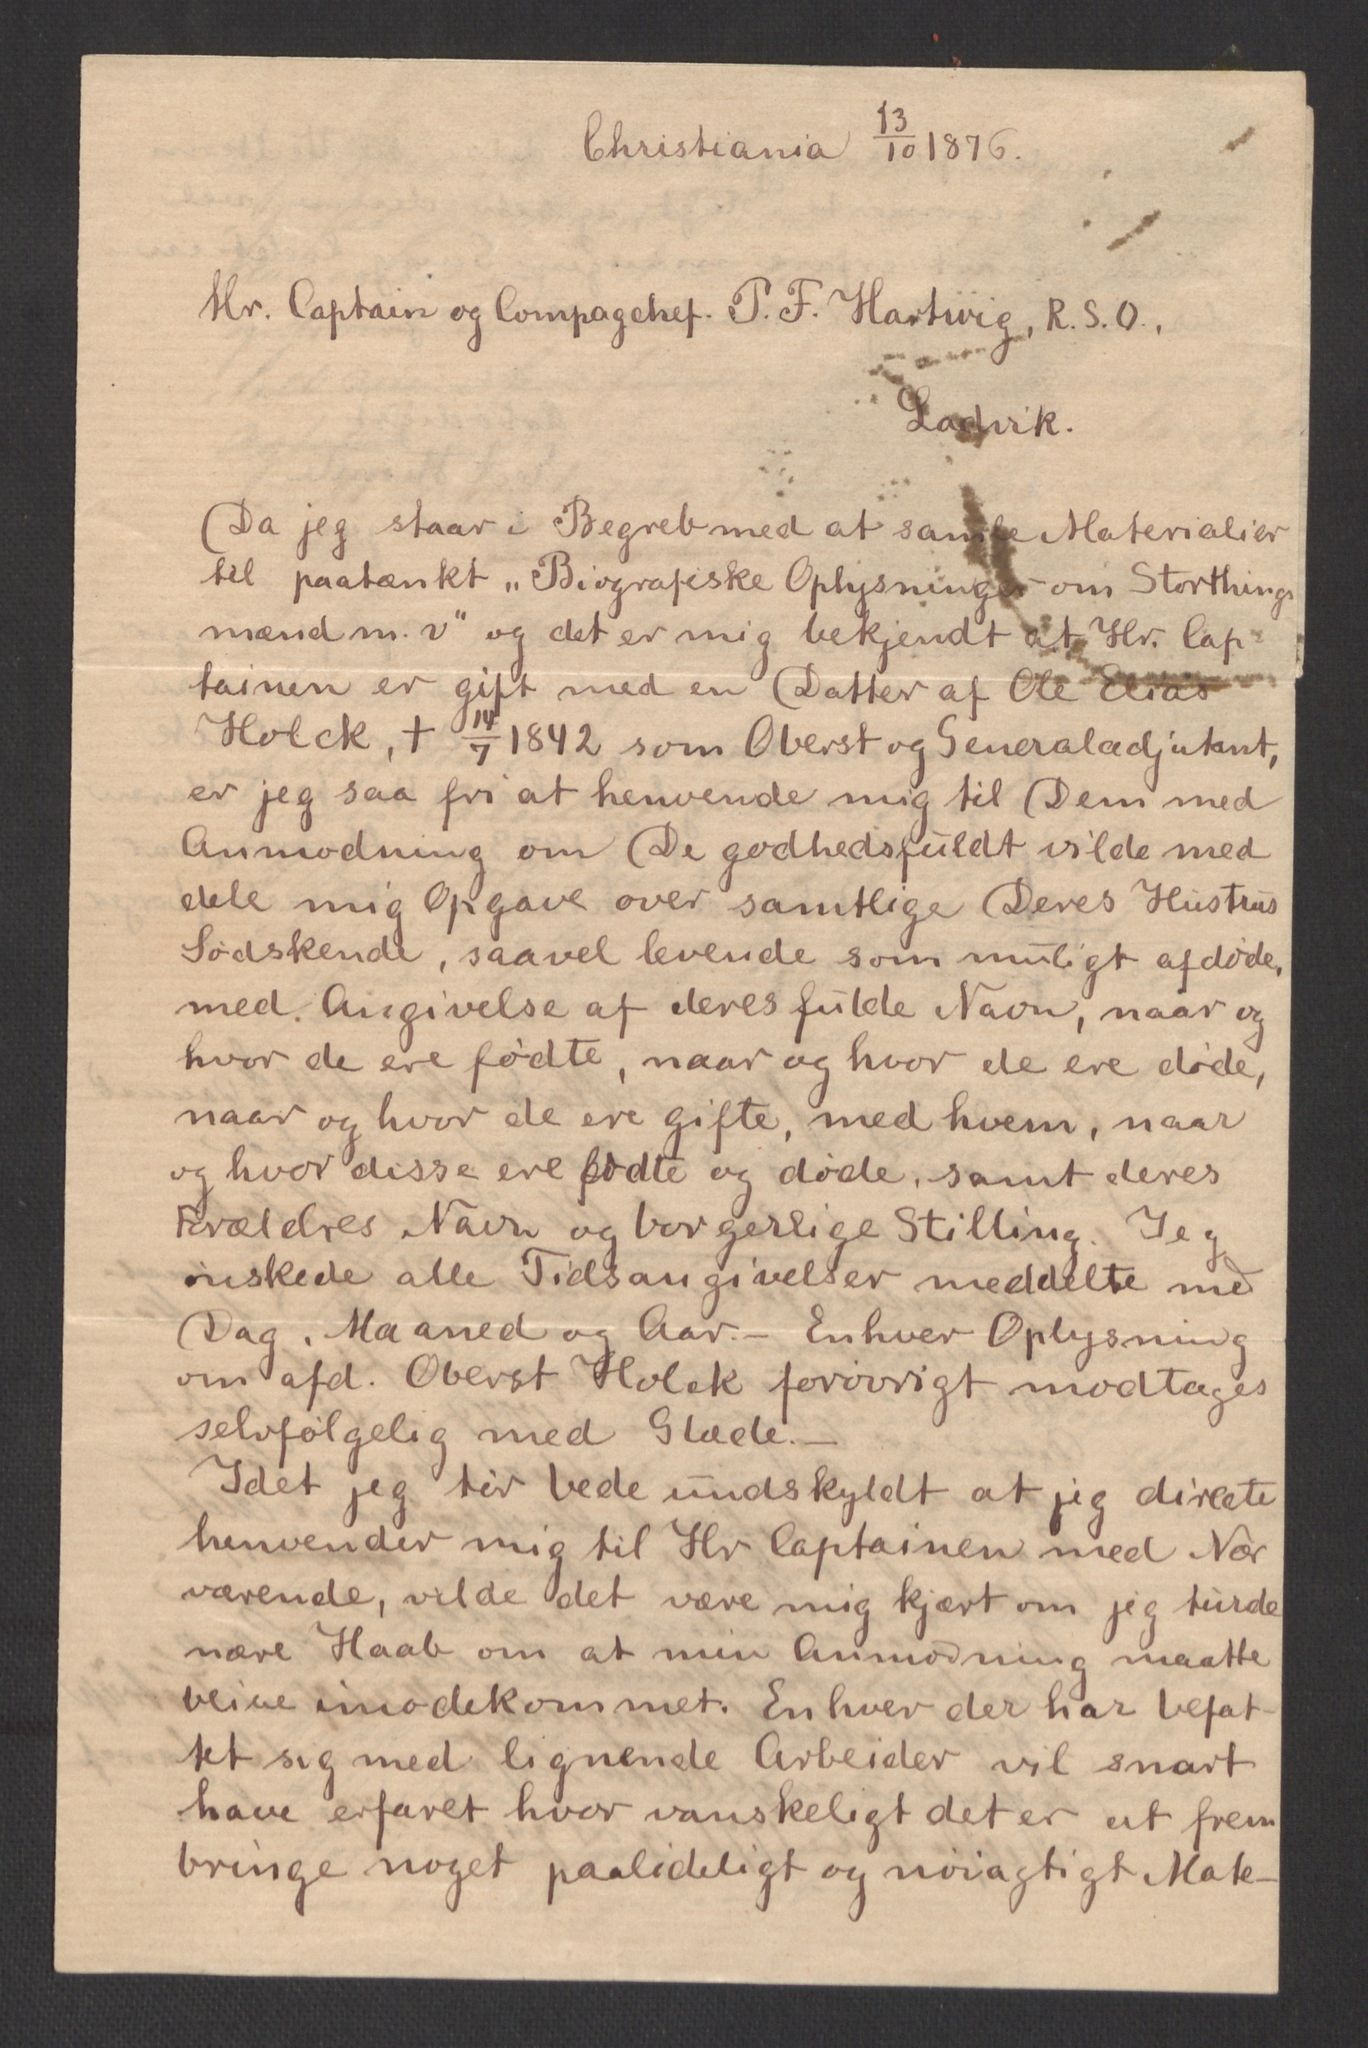 RA, Holck, Meidell, Hartvig, F/L0002: (Pakke 1), 1762-1864, s. 166